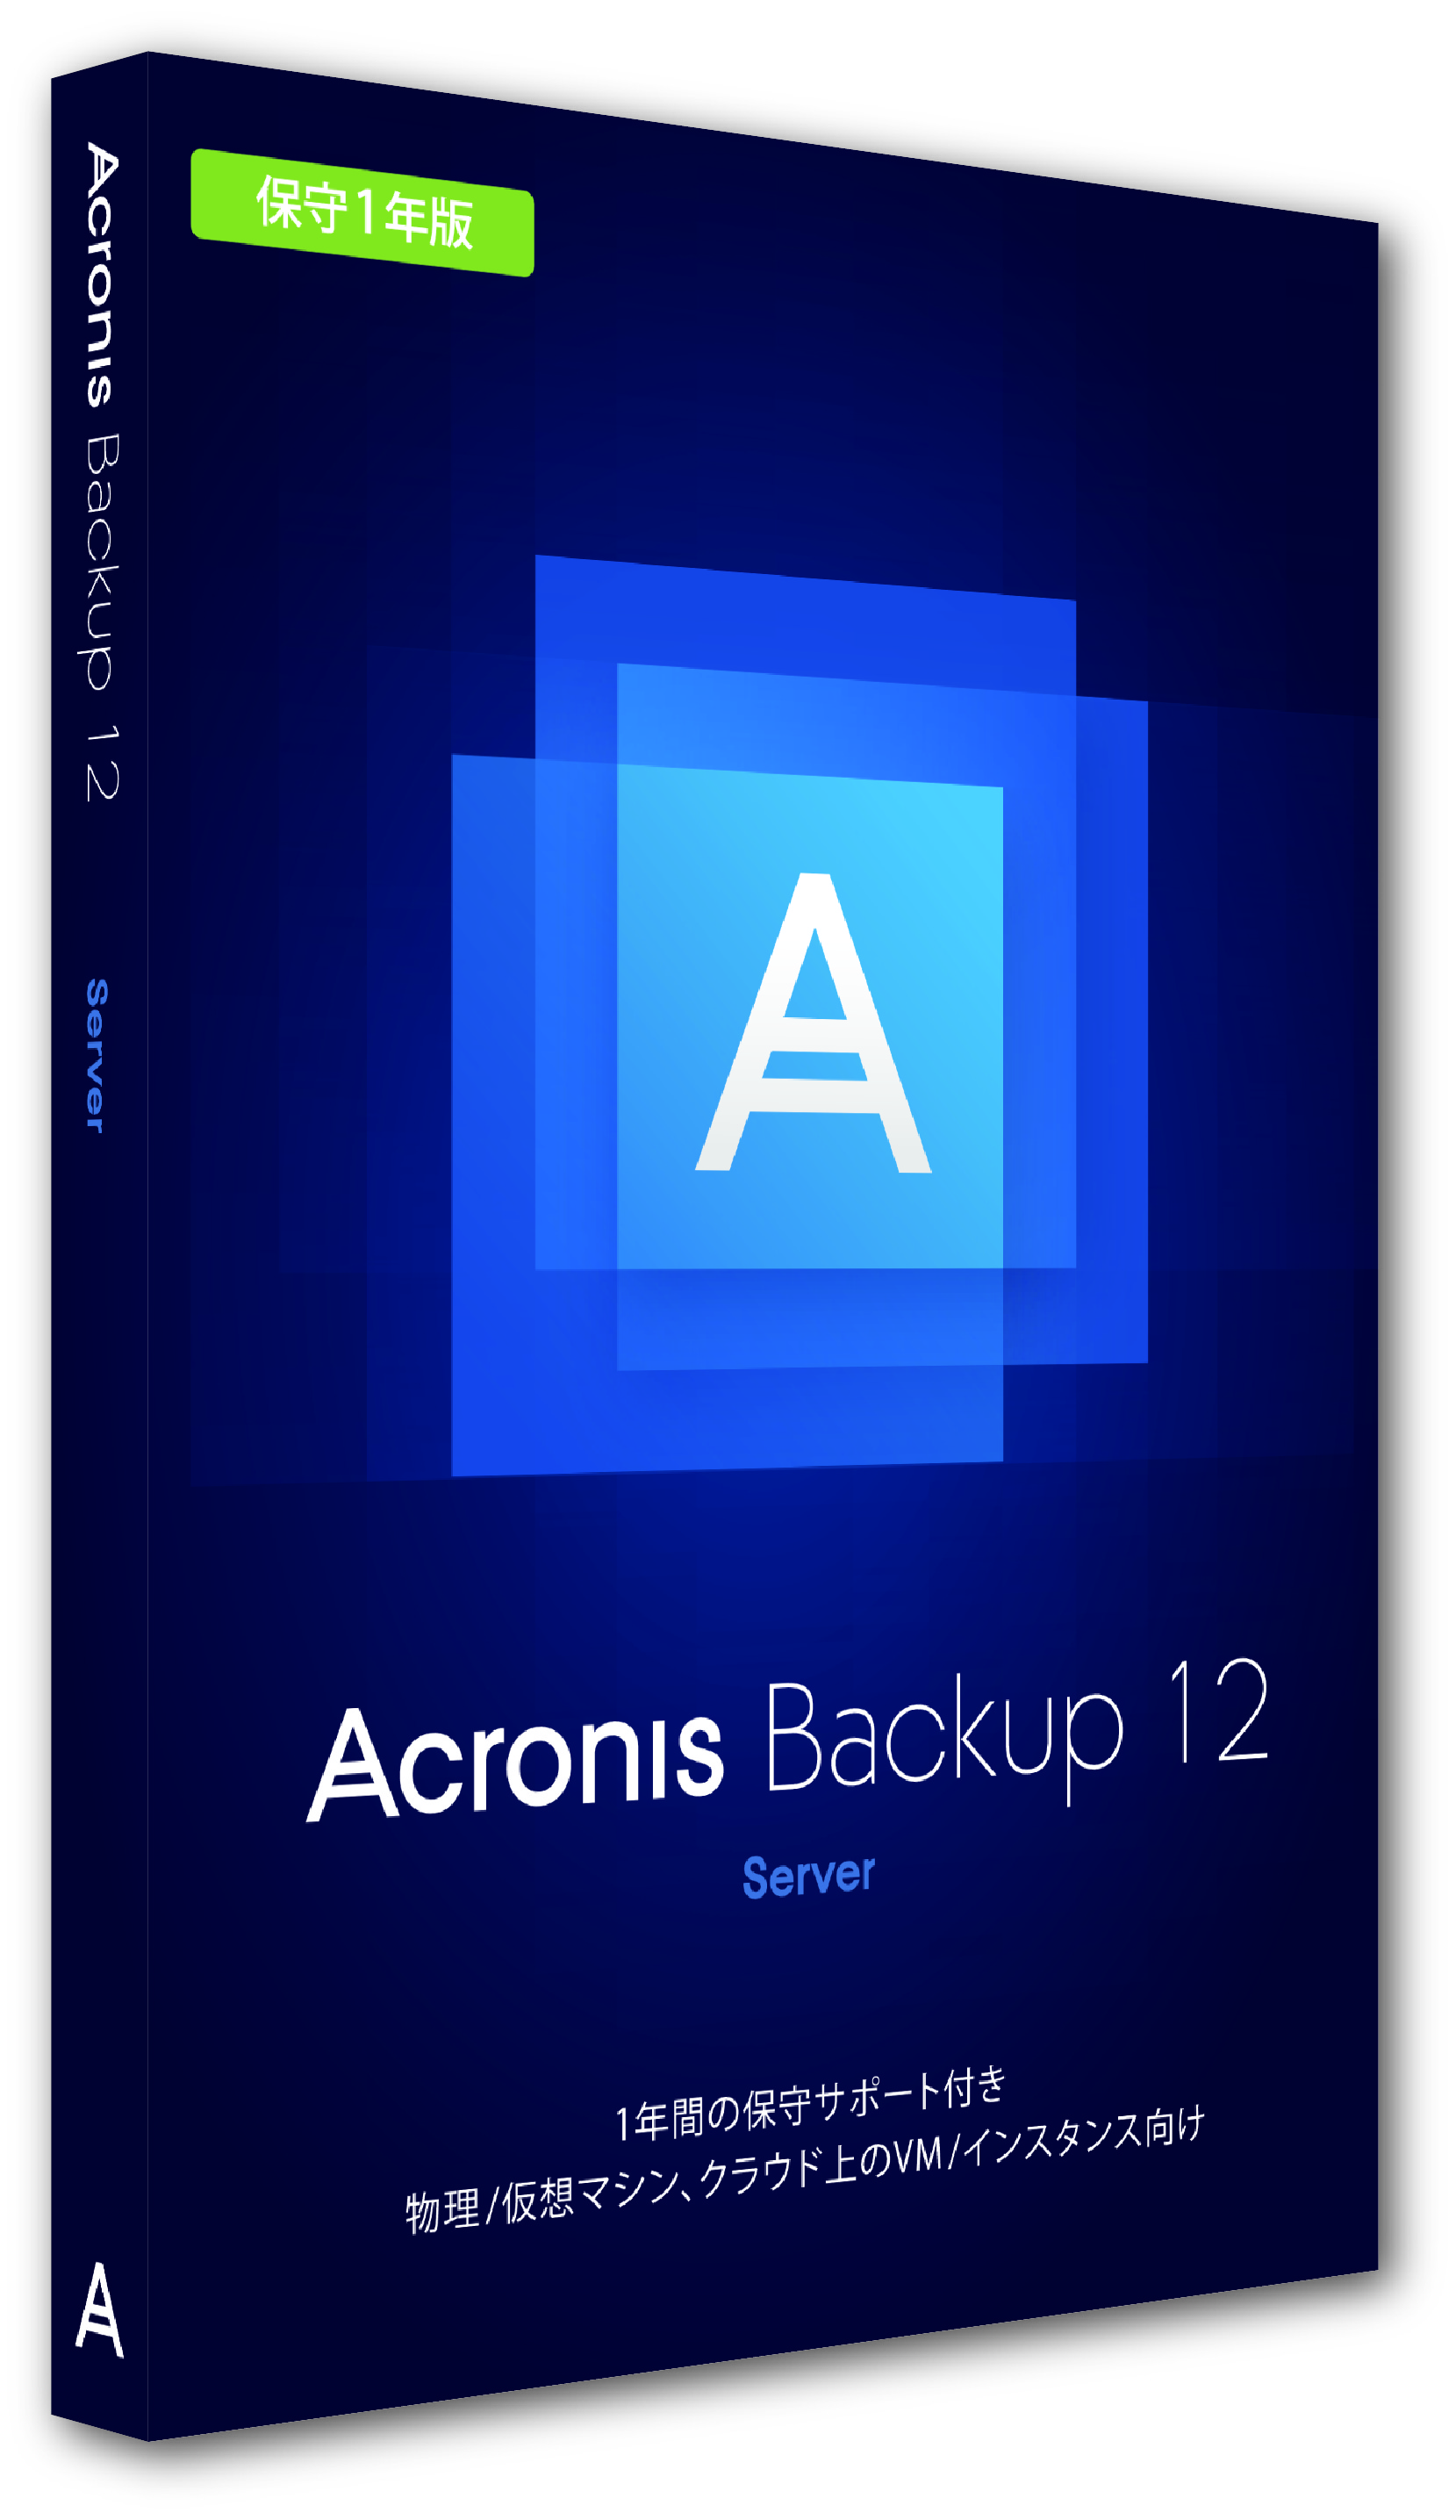 Acronis_image